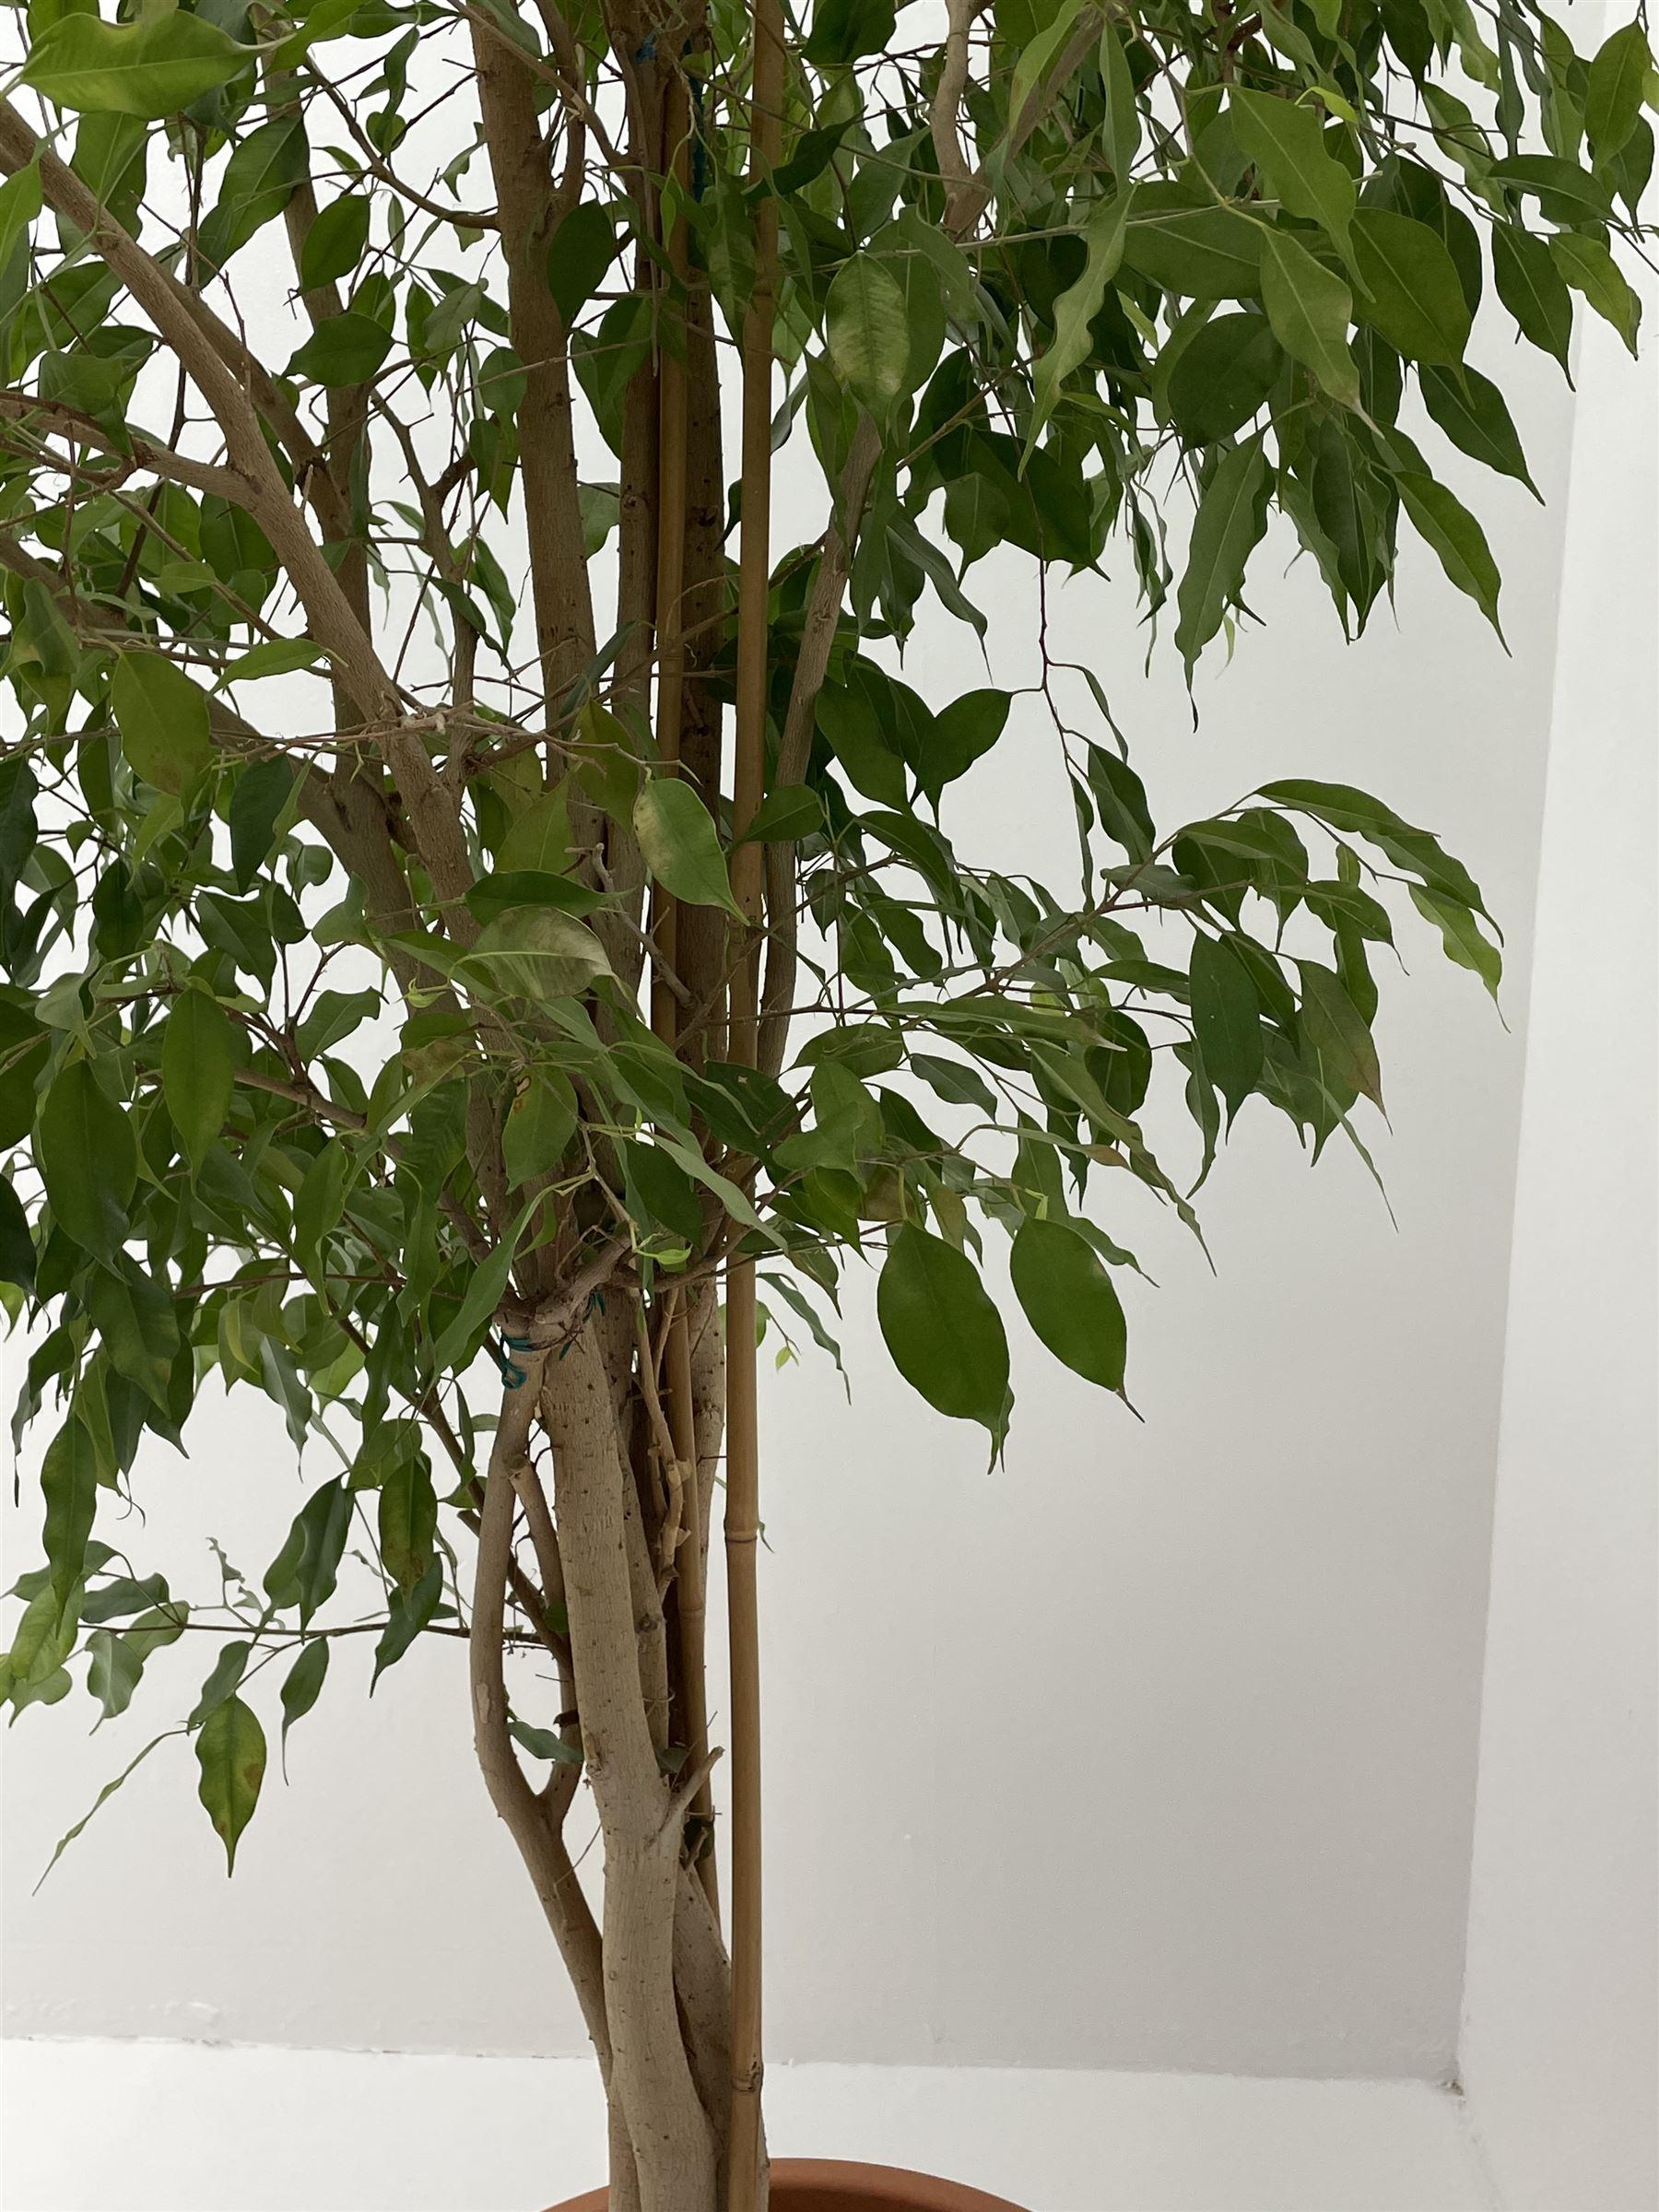 Weeping fig - Image 4 of 4